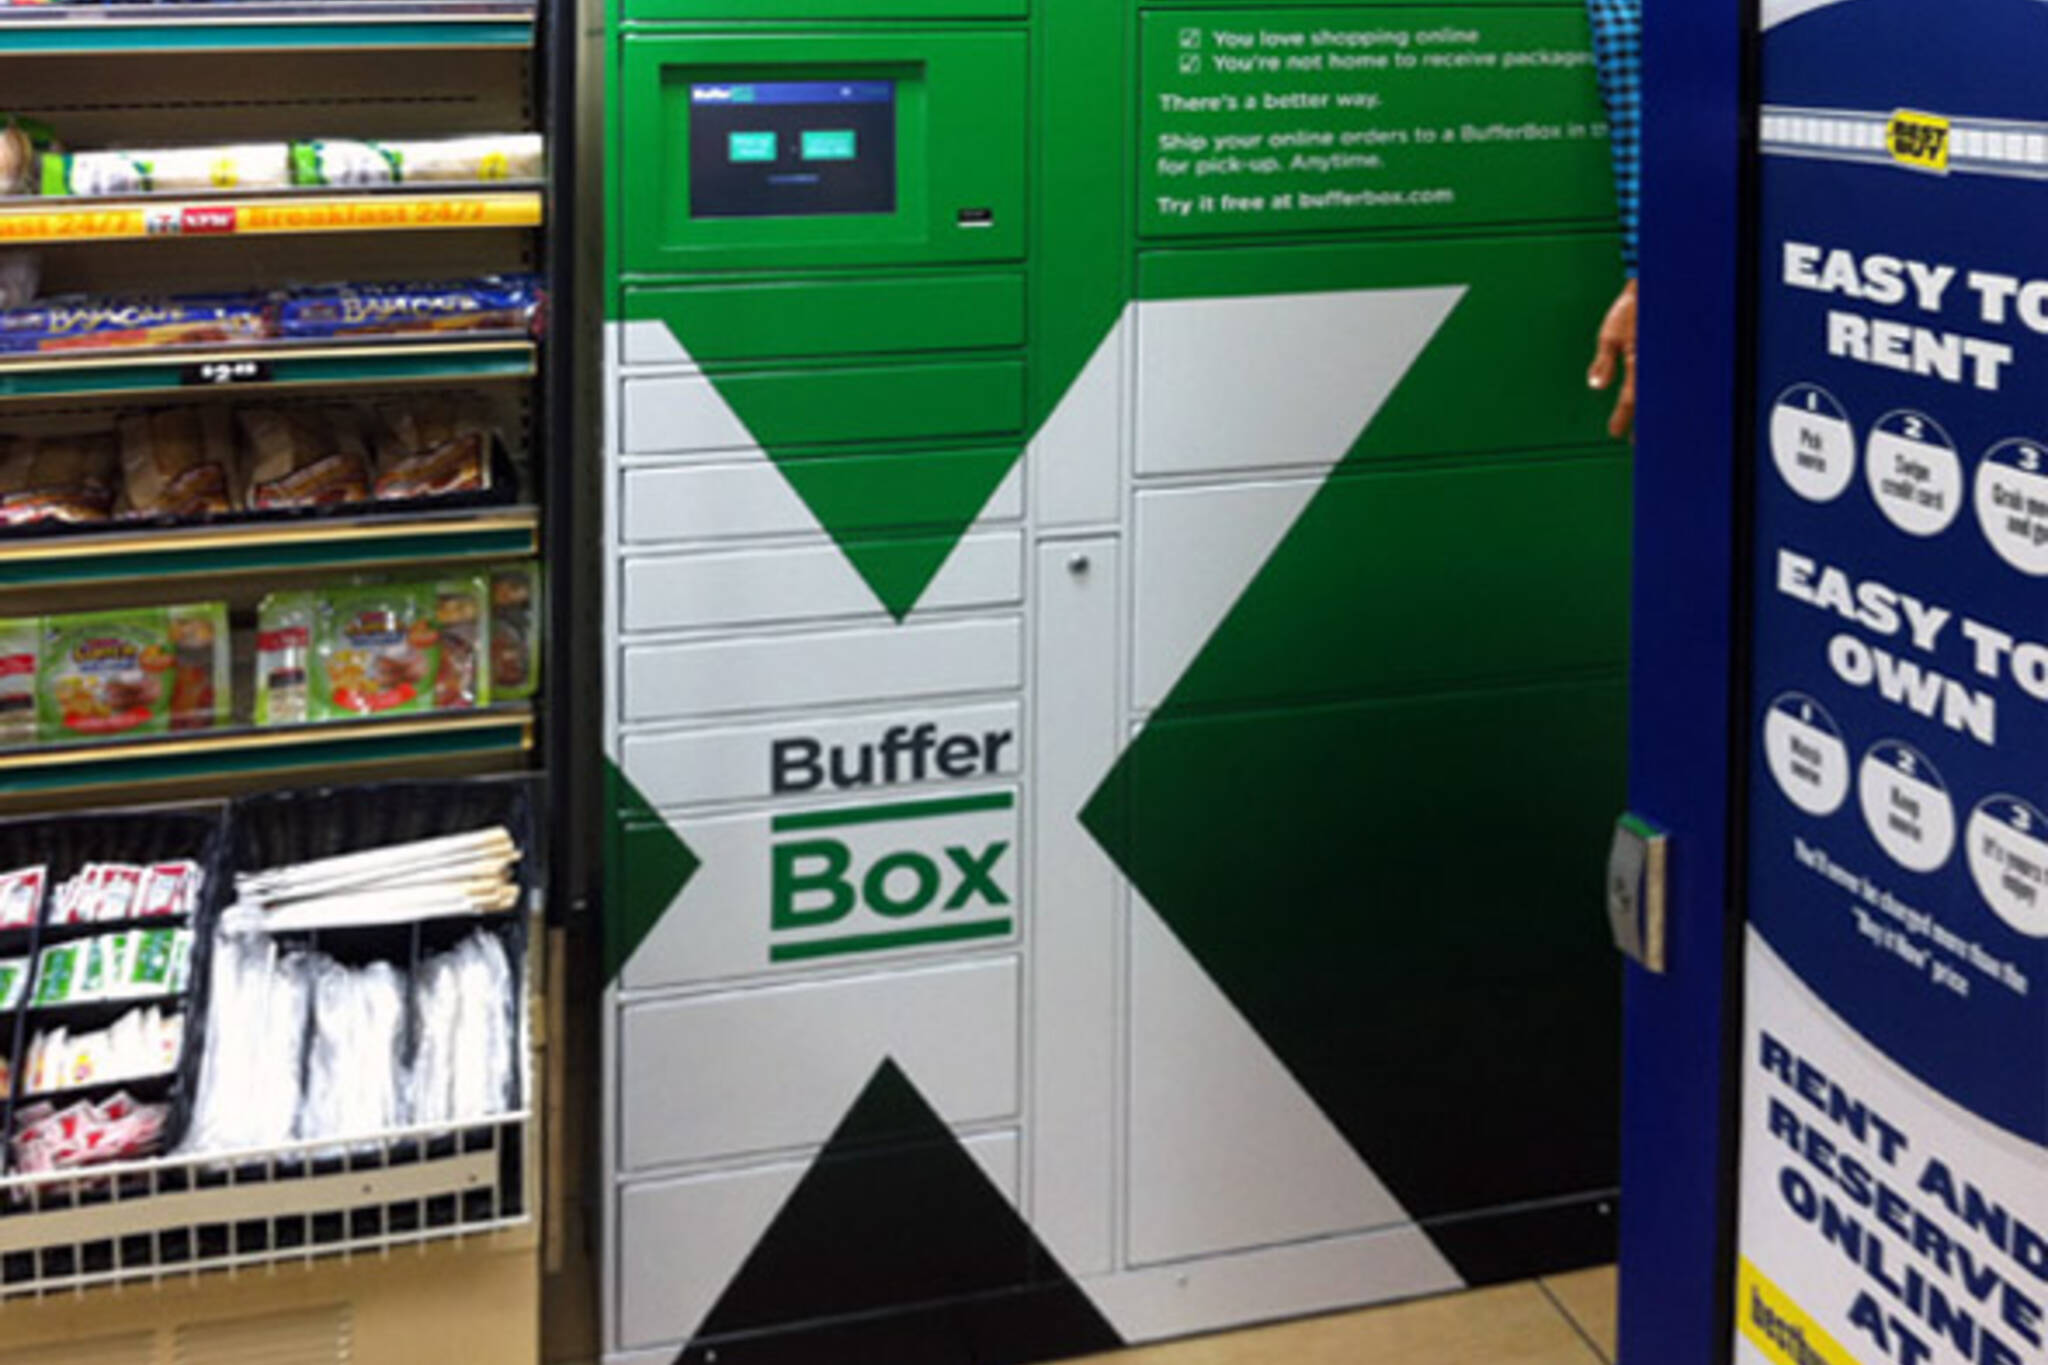 Bufferbox Toronto